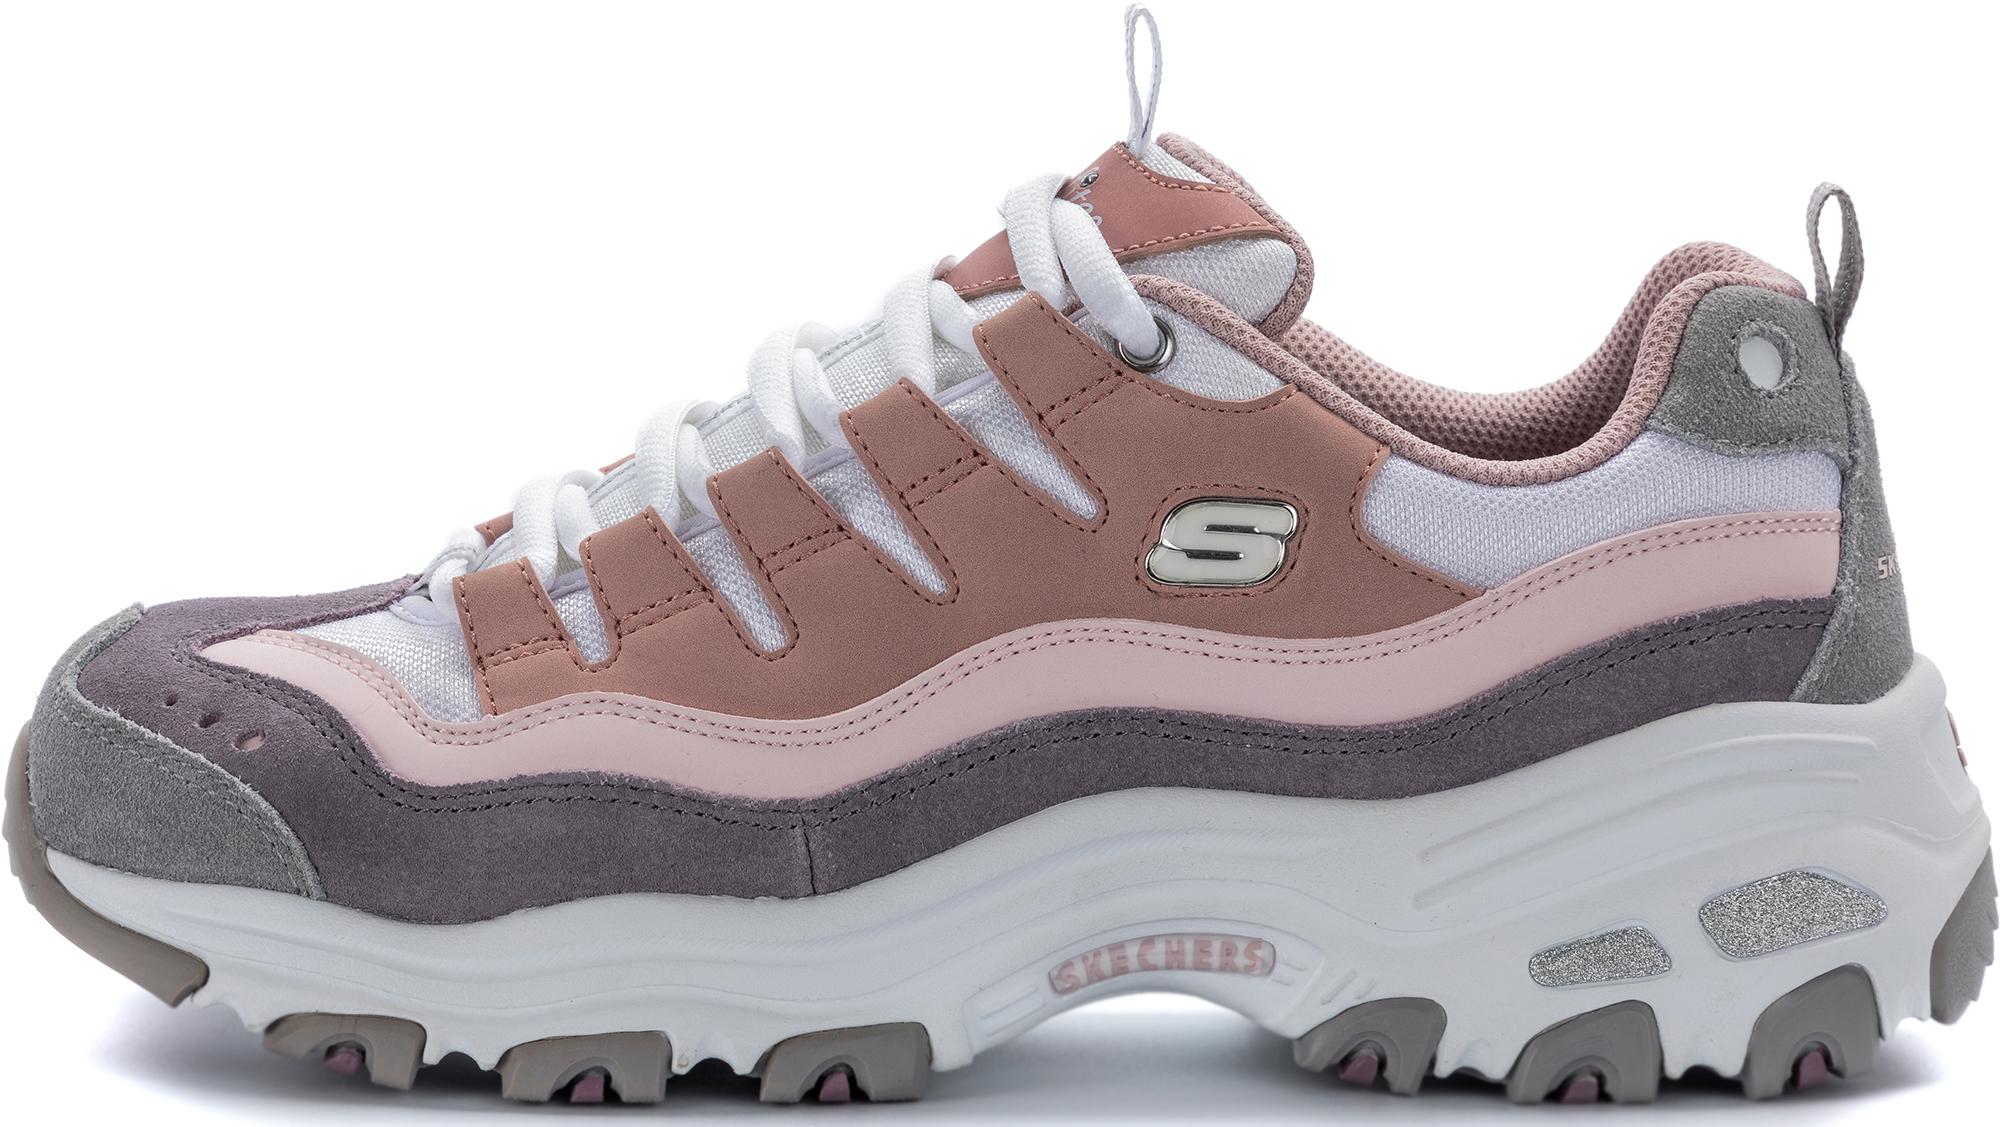 Skechers Кроссовки женские DLites-Sure Thing, размер 37